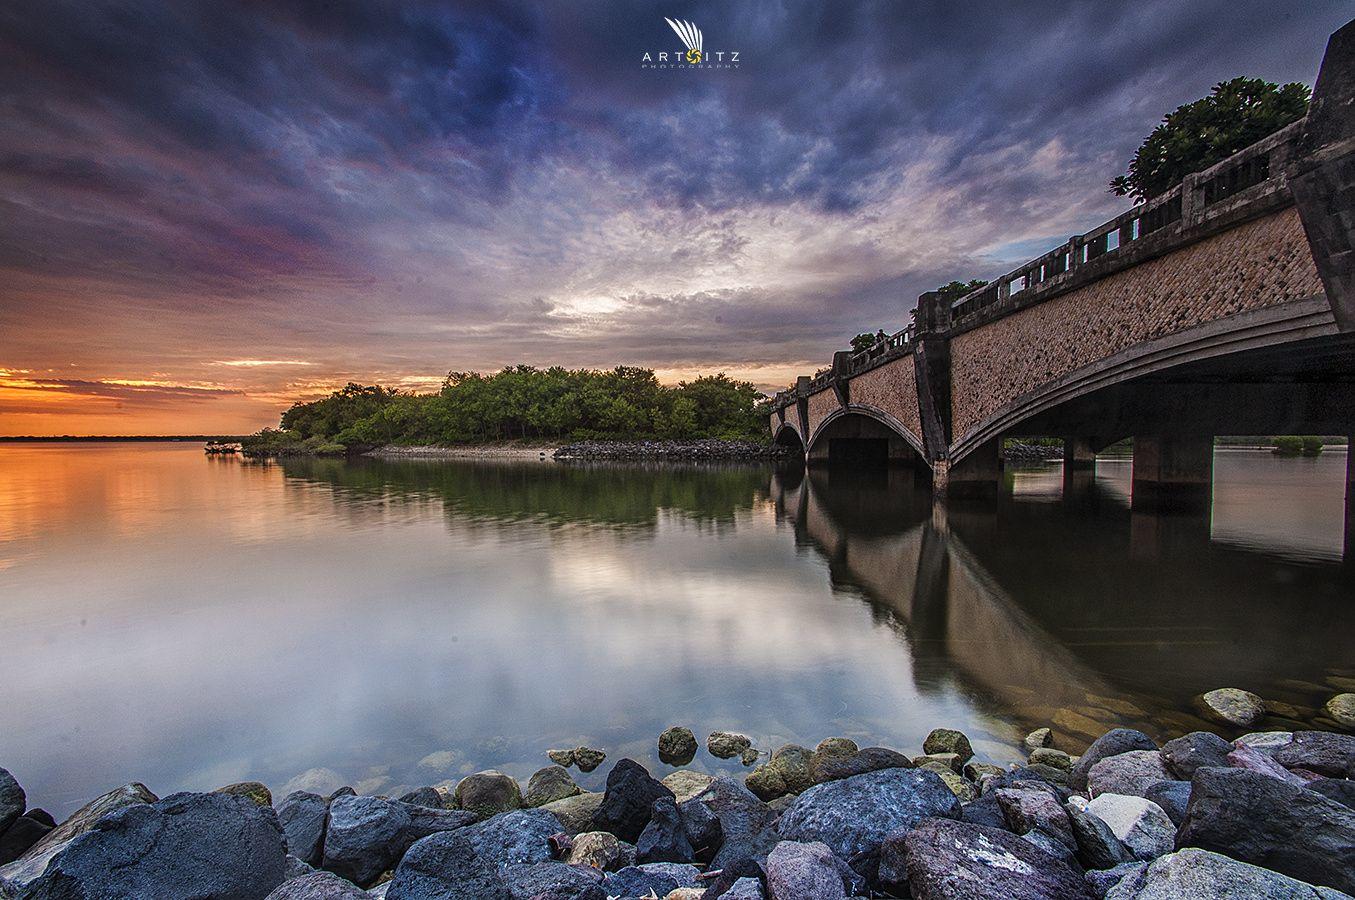 Serangan Bridge - Cloudy Sunset at Serangan,